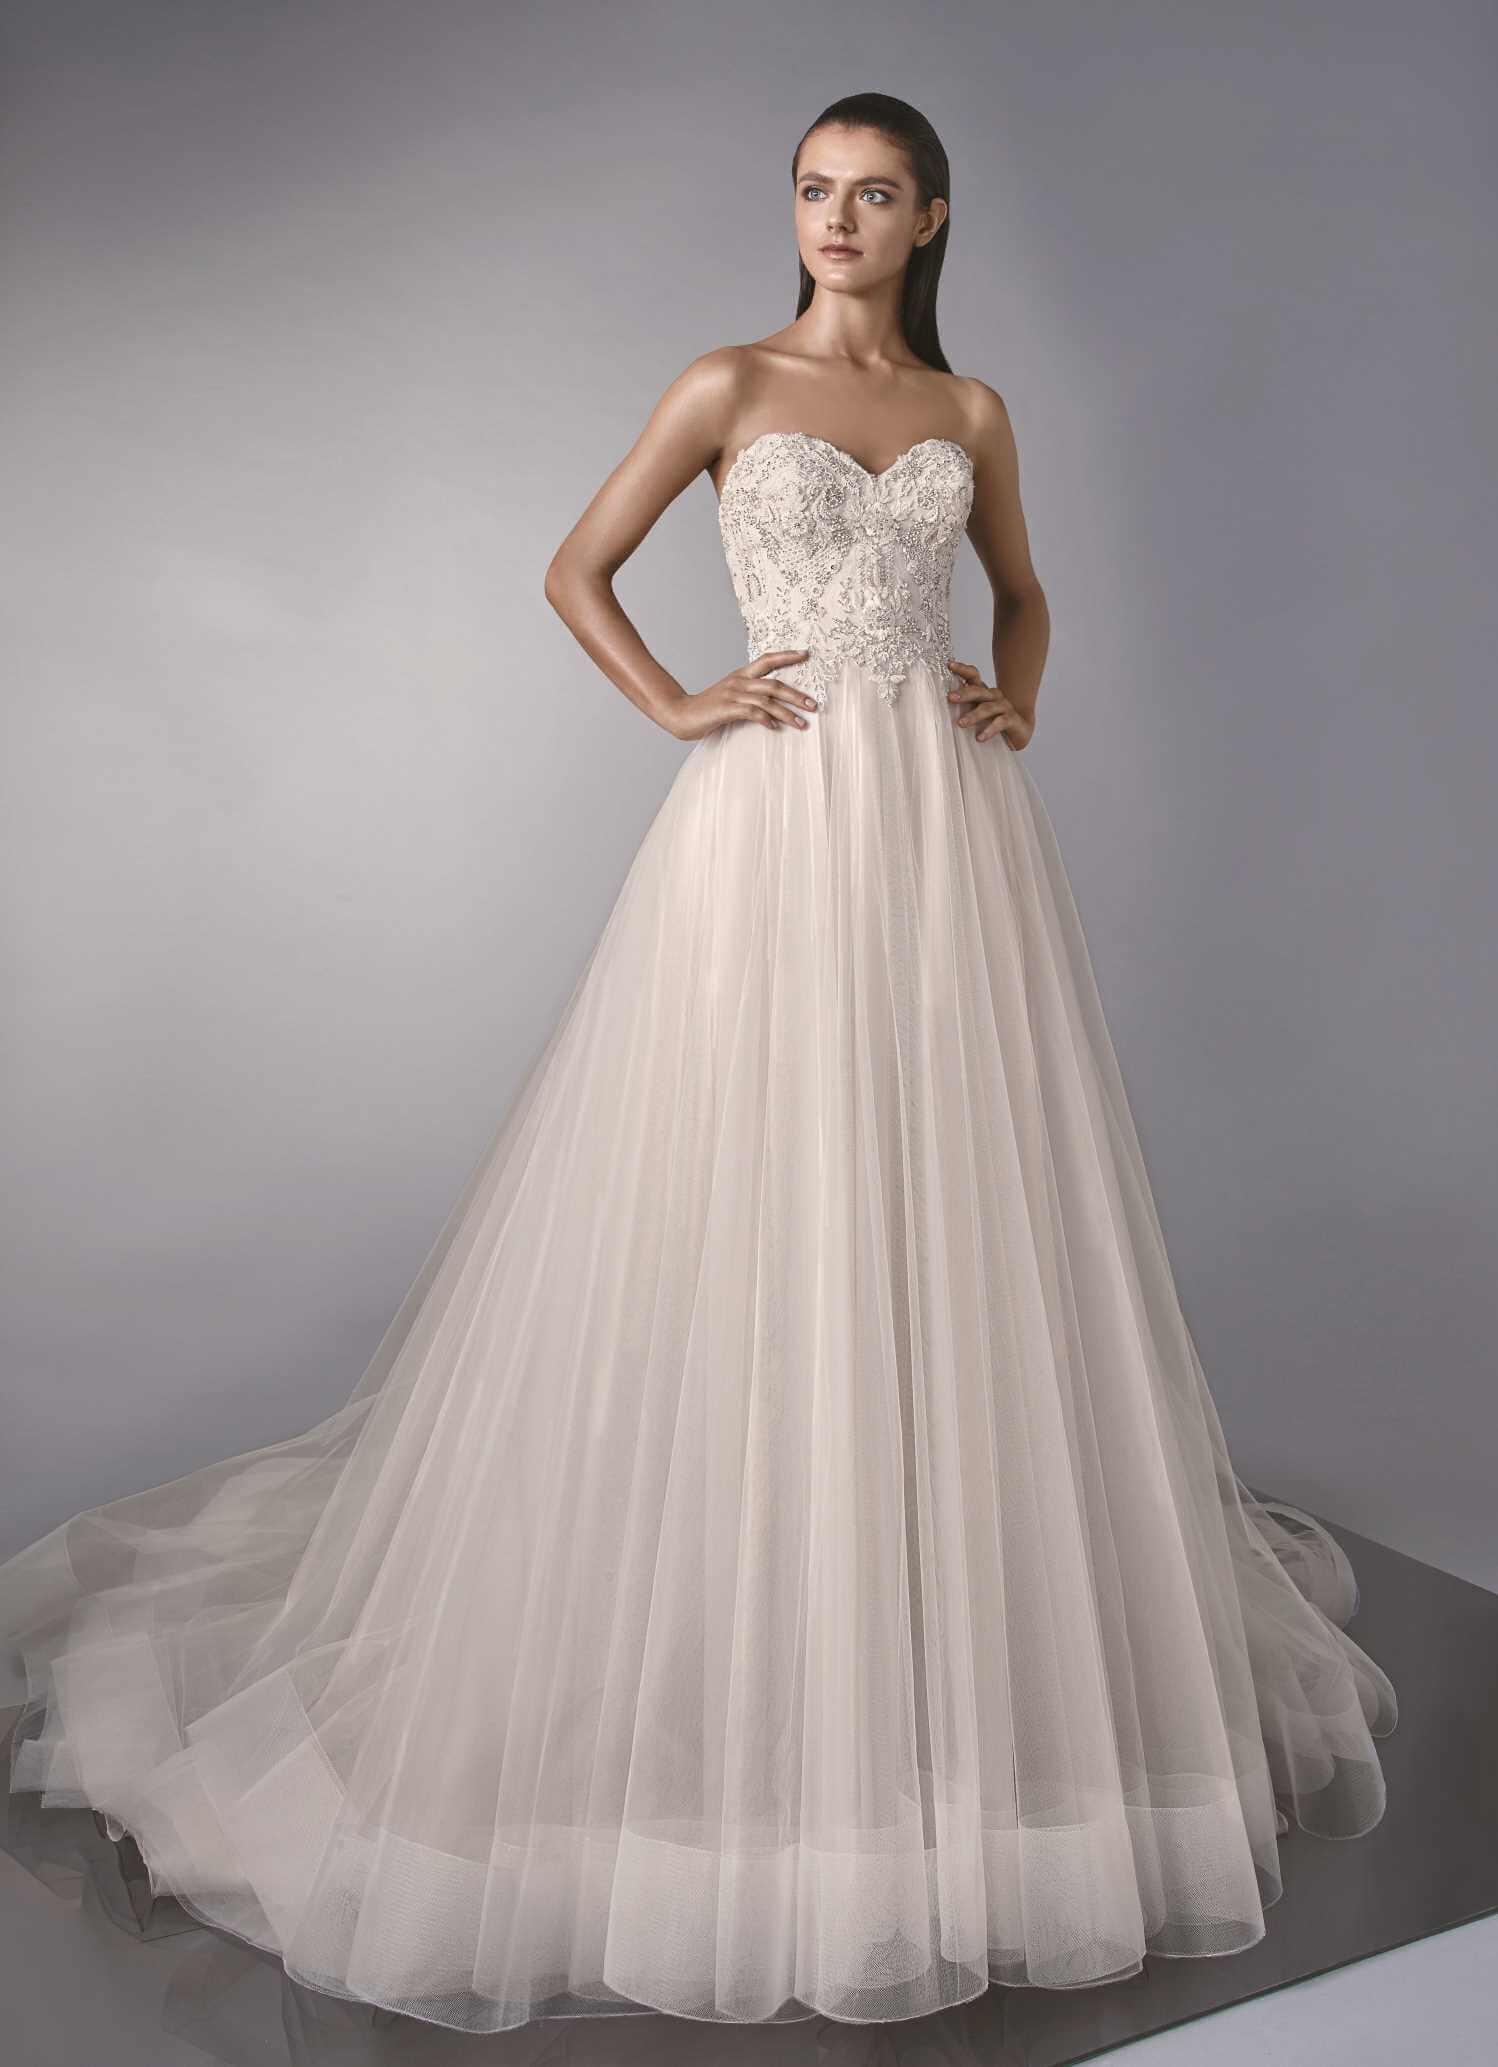 Enzoani- Bridal-wear Norwich. Enzoani Collection Here